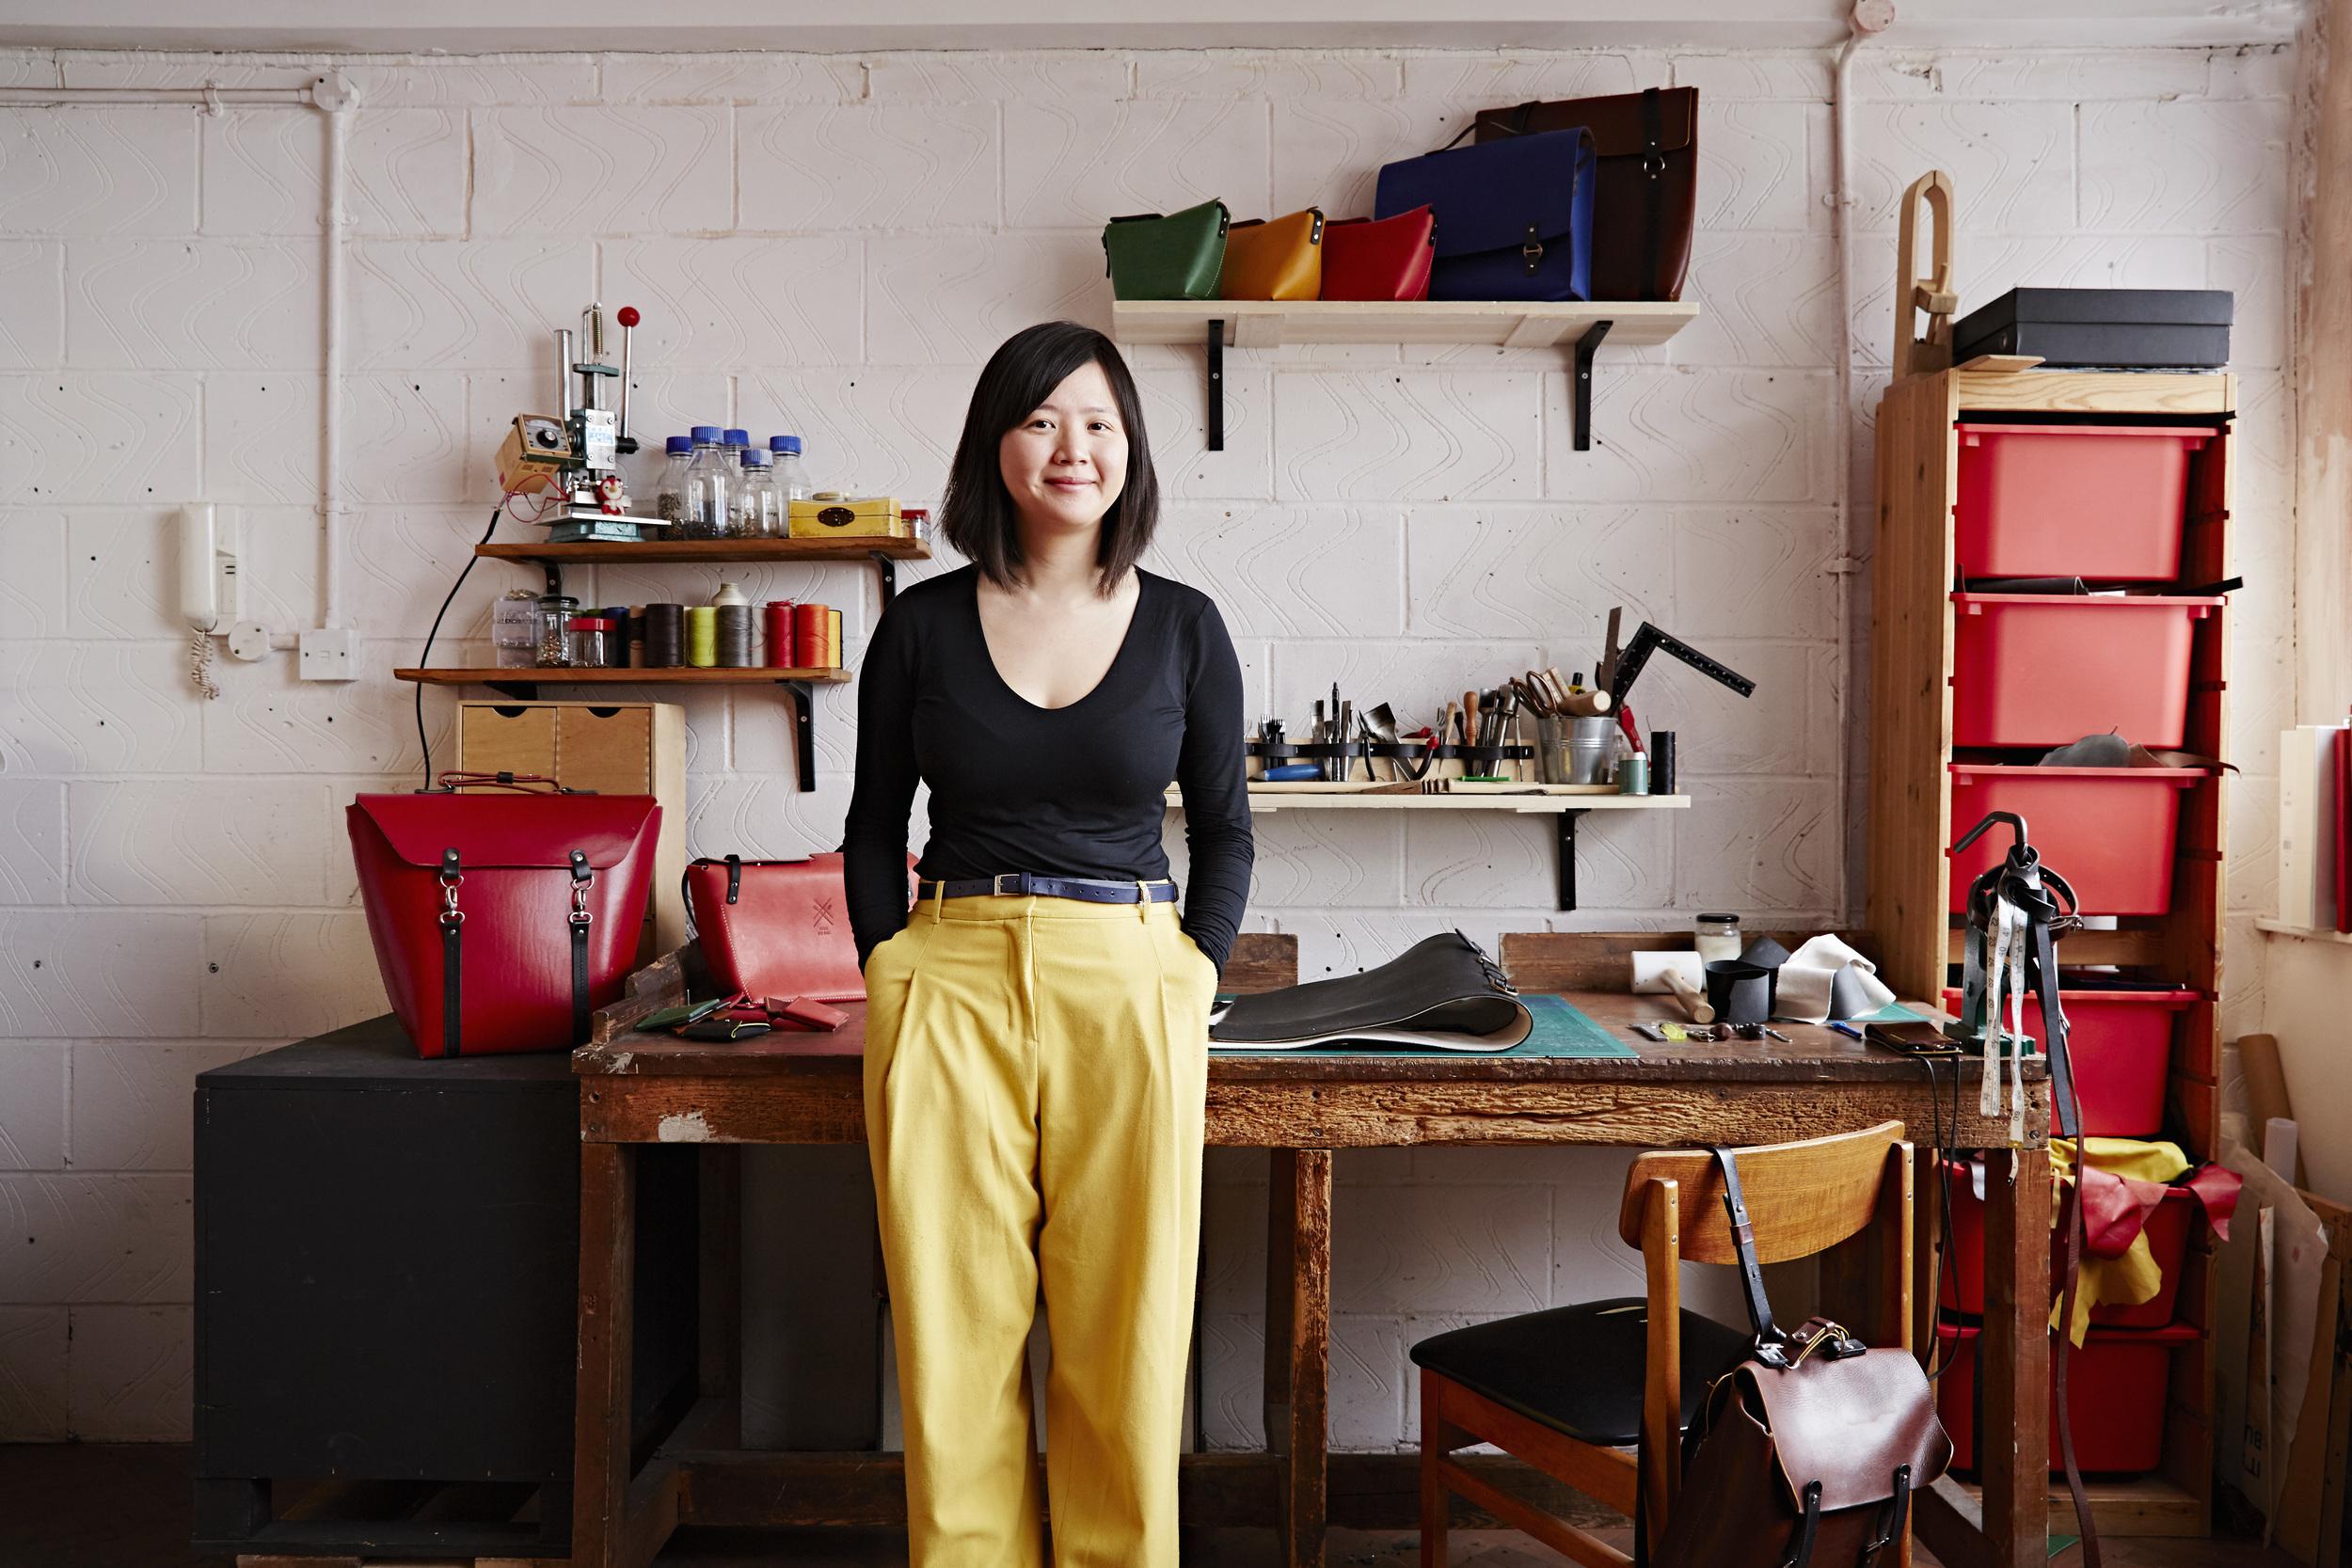 Craftsperson Candice Lau - image by Alun Callender